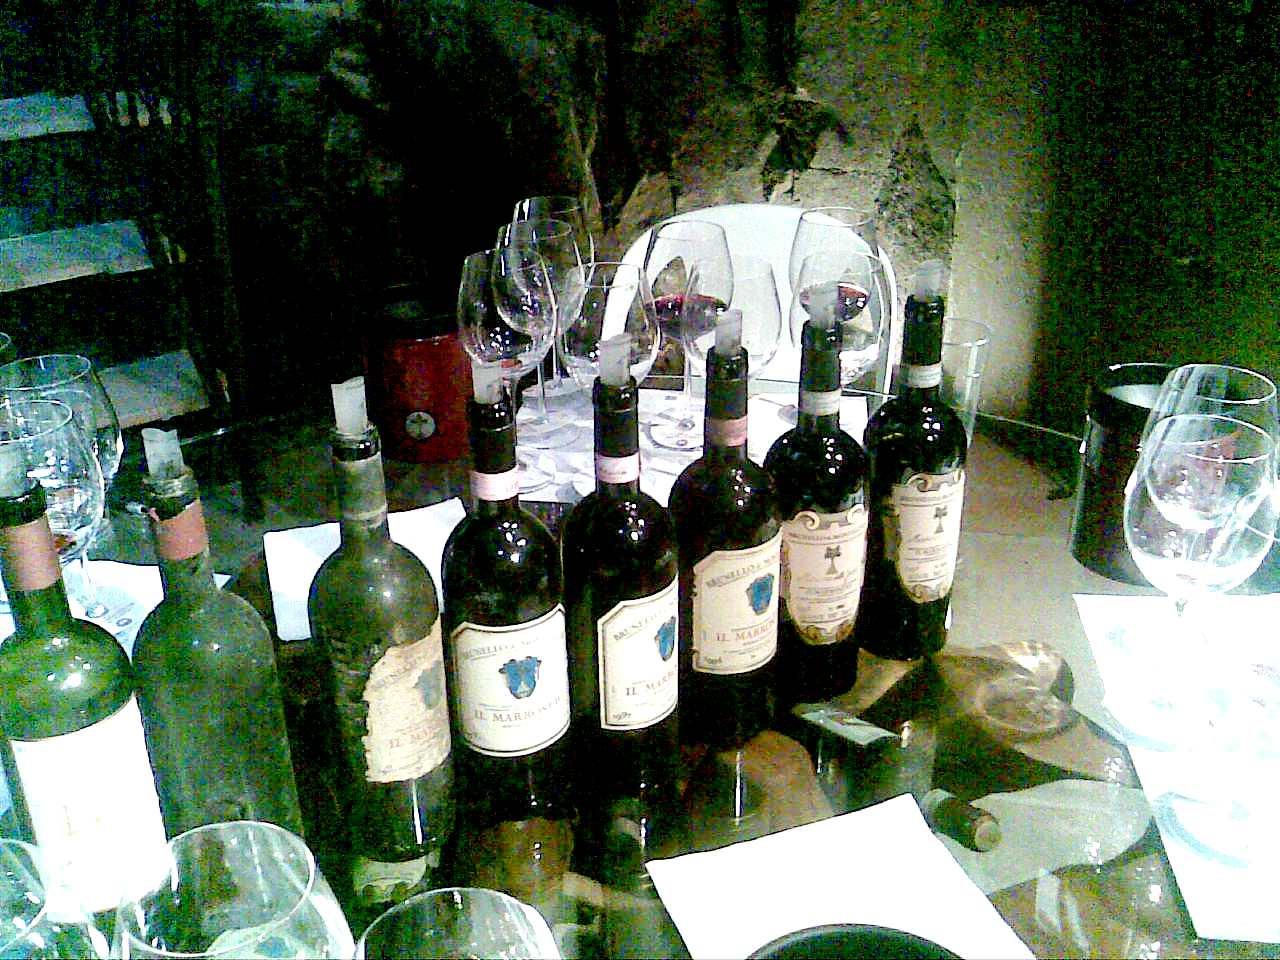 Il Marroneto_bottiglie